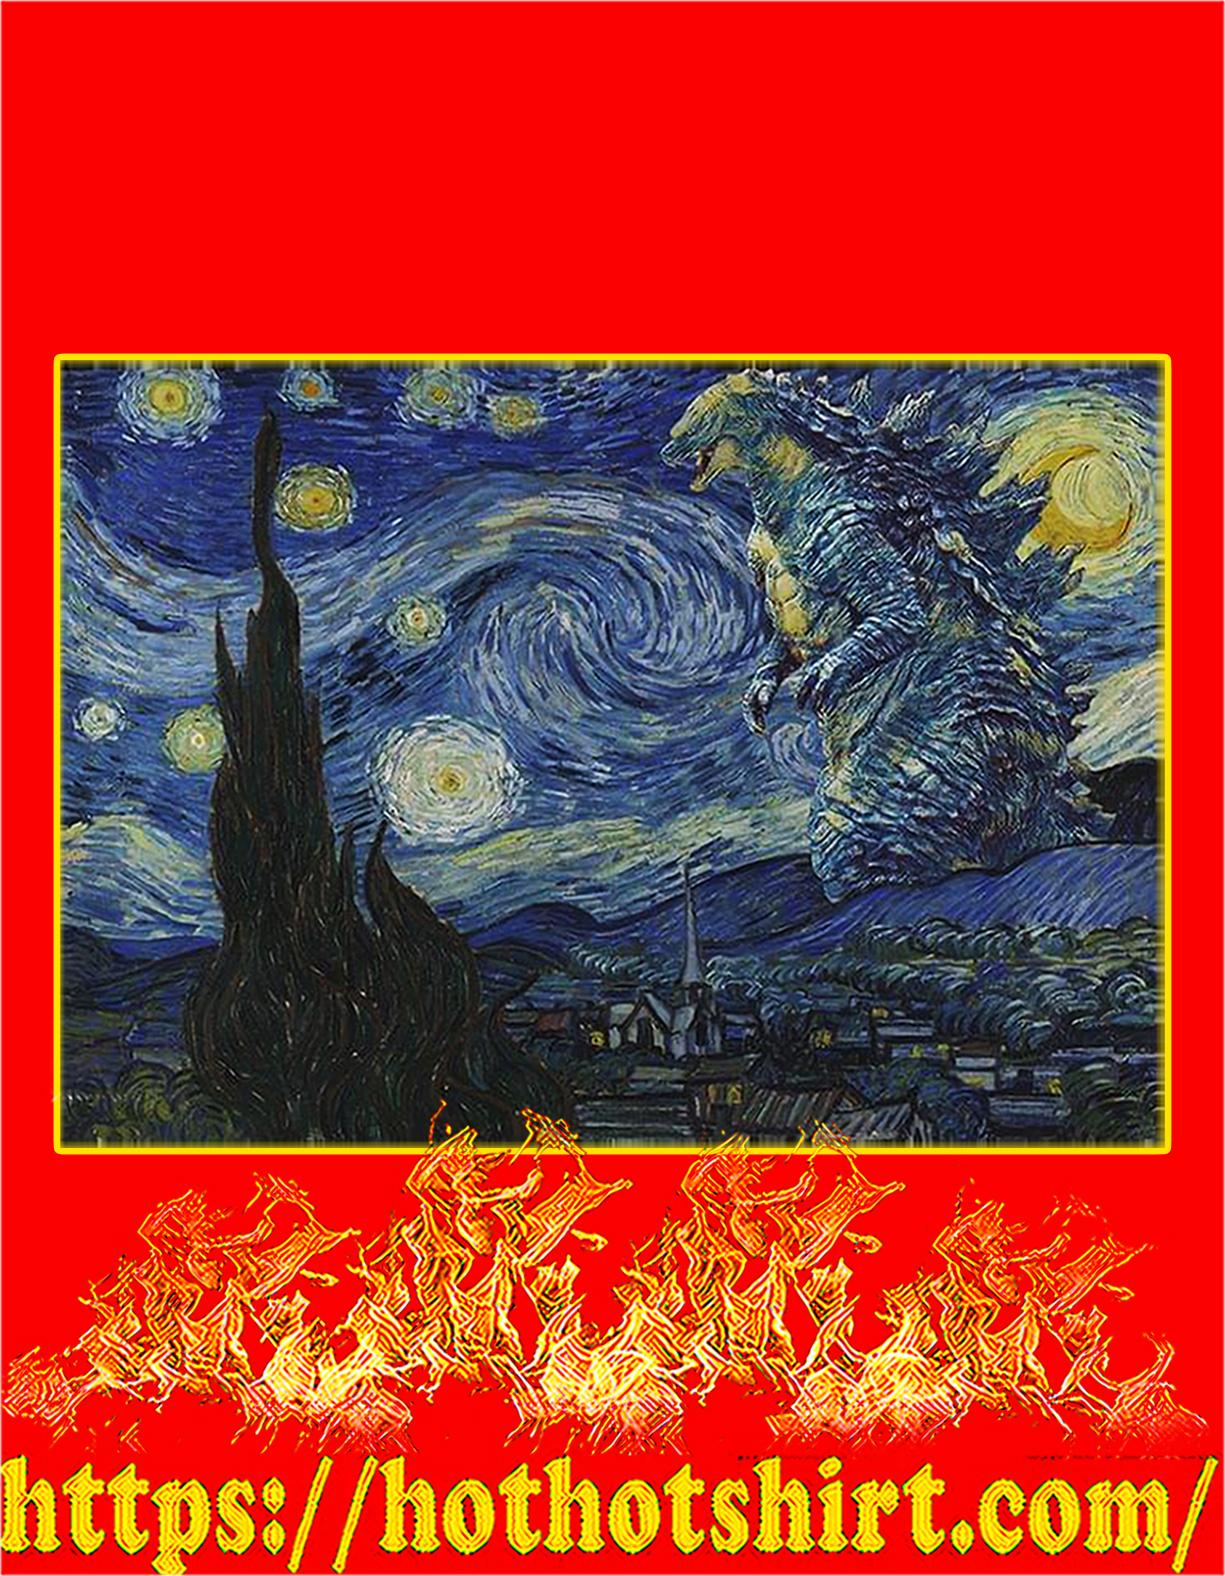 Godzzila starry night poster - A3